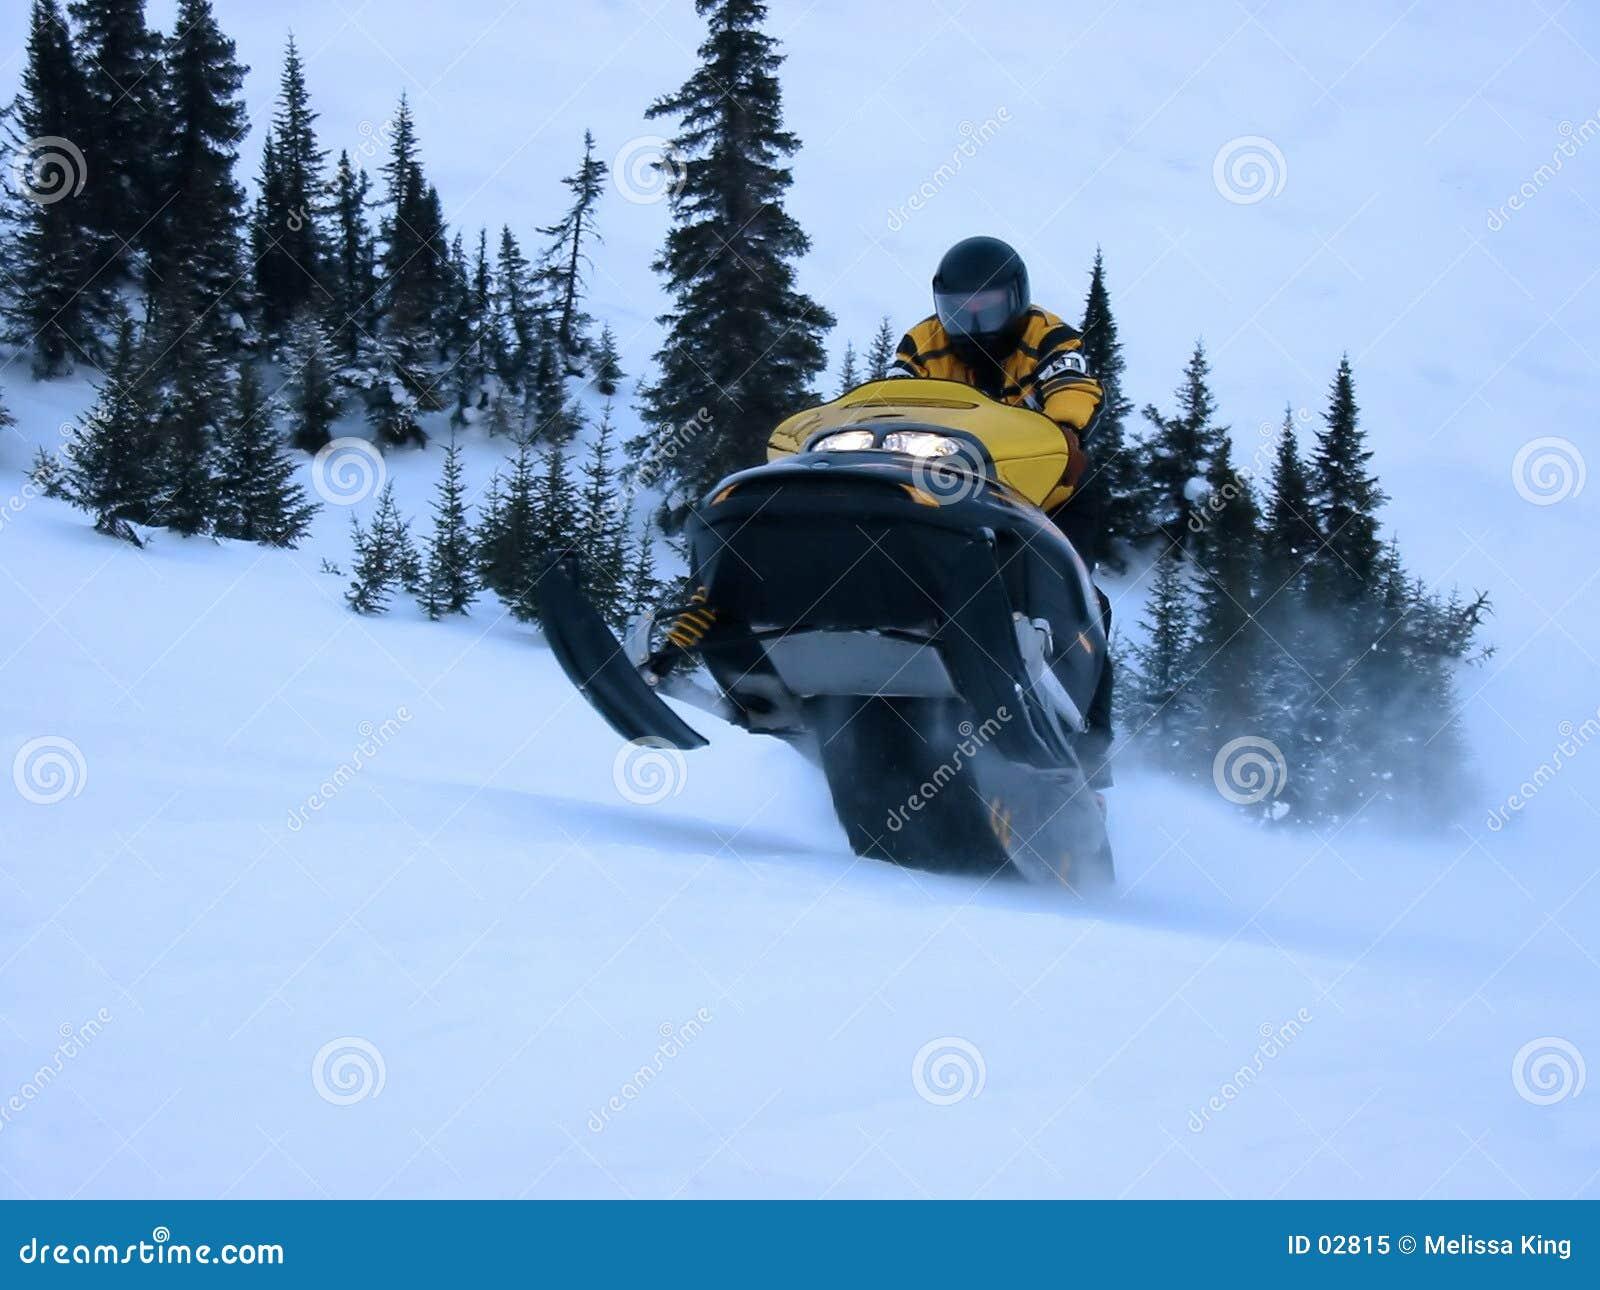 Ski-Doo taking Jump